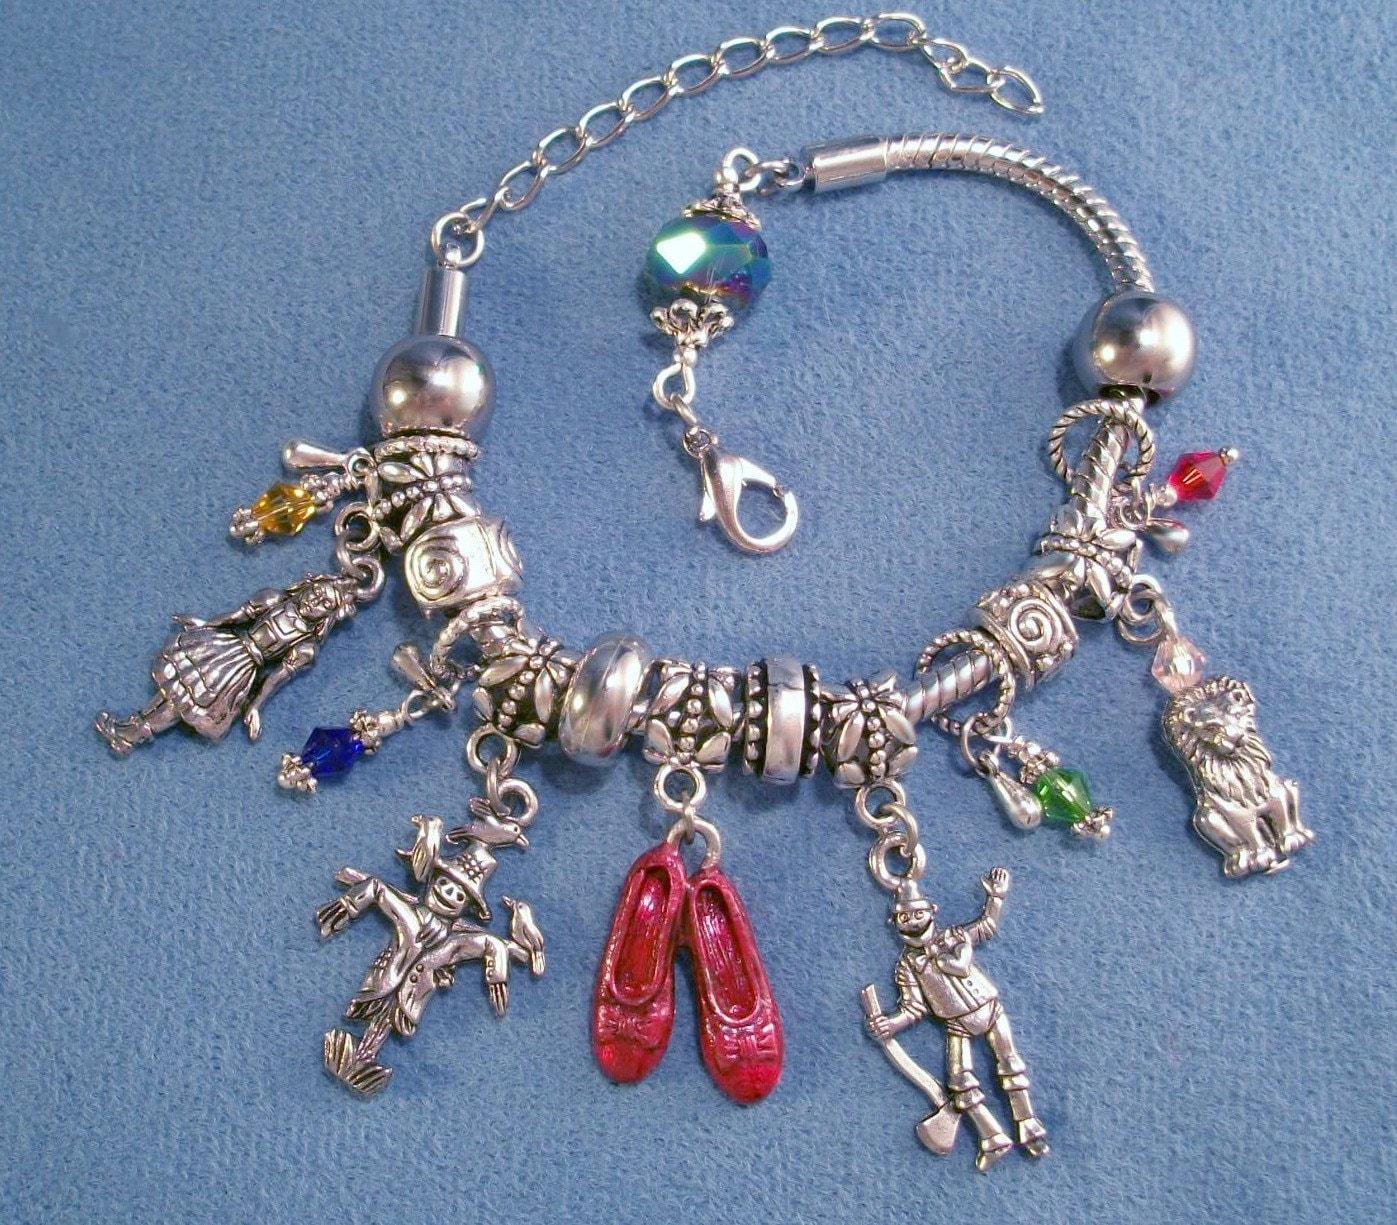 Slide Charms For Bracelets: Wizard Of Oz Starter Charm Bracelet Pandora Style Slide On